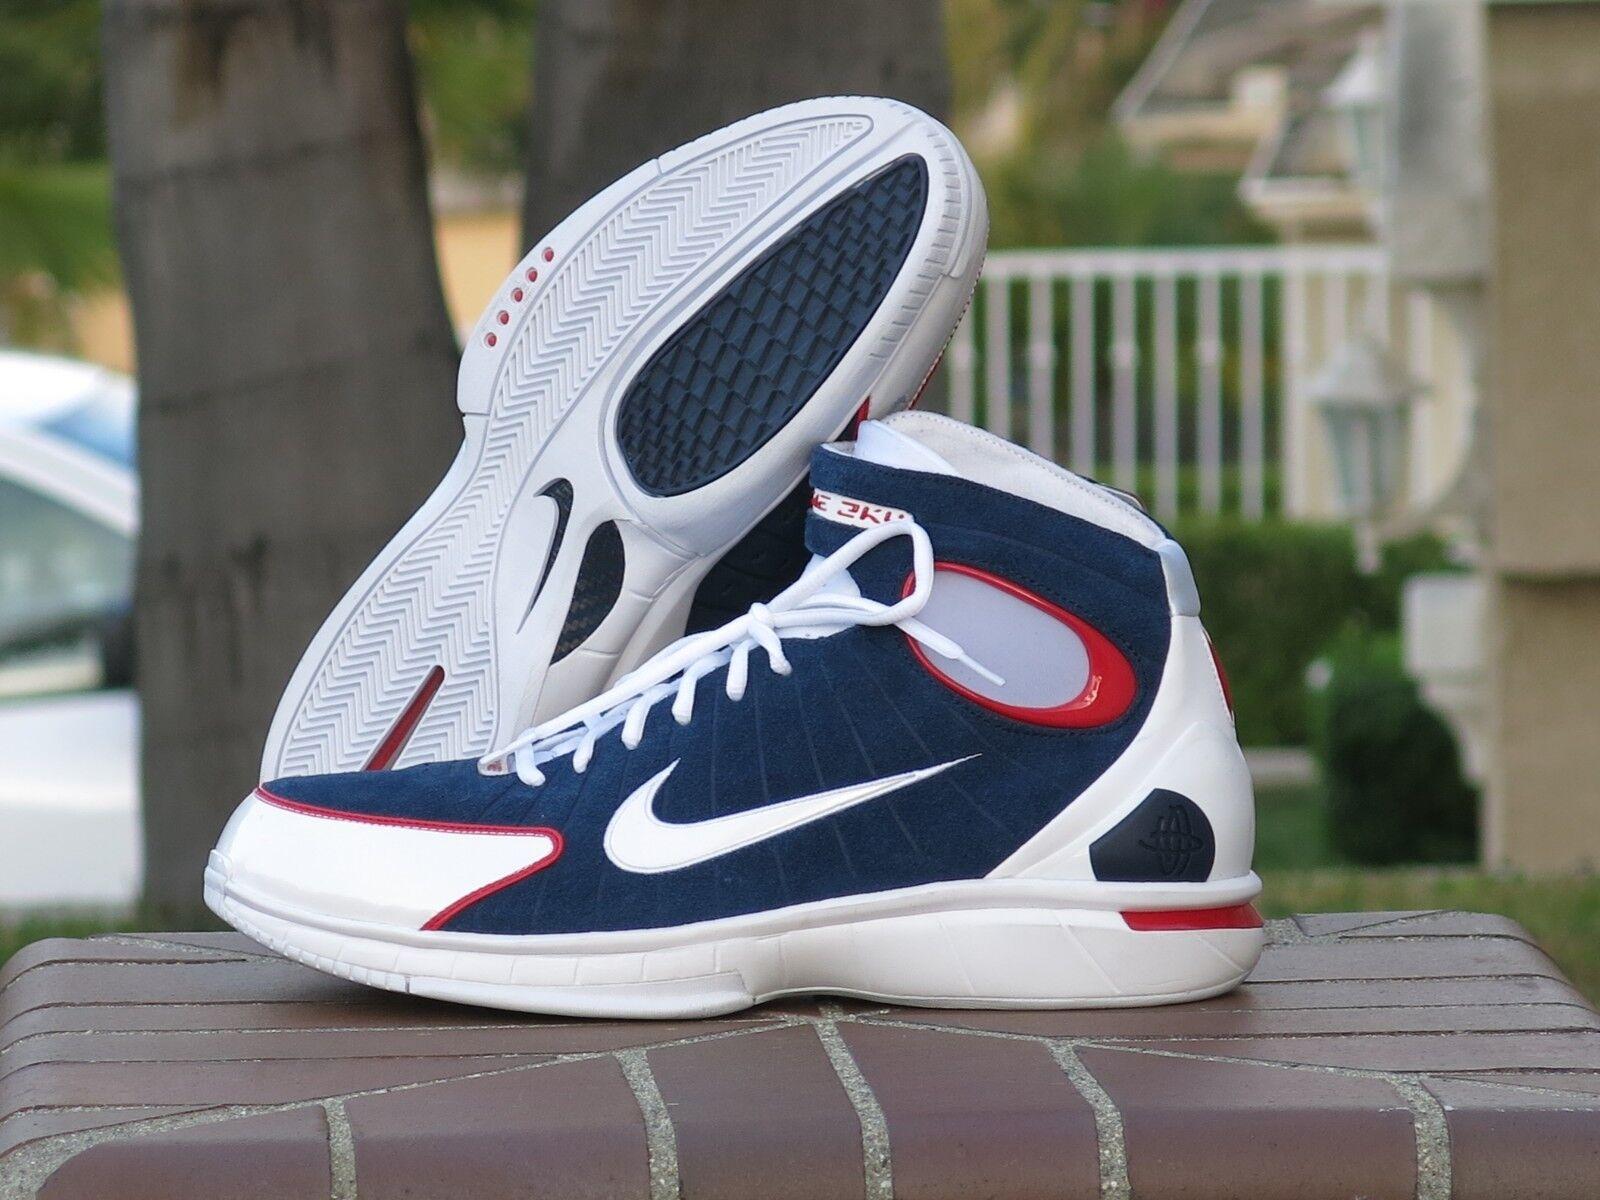 f2bdae08ead90 Nike Air Zoom Huarache 2k4 Basketball Shoes Mens Sz 11 Red White ...